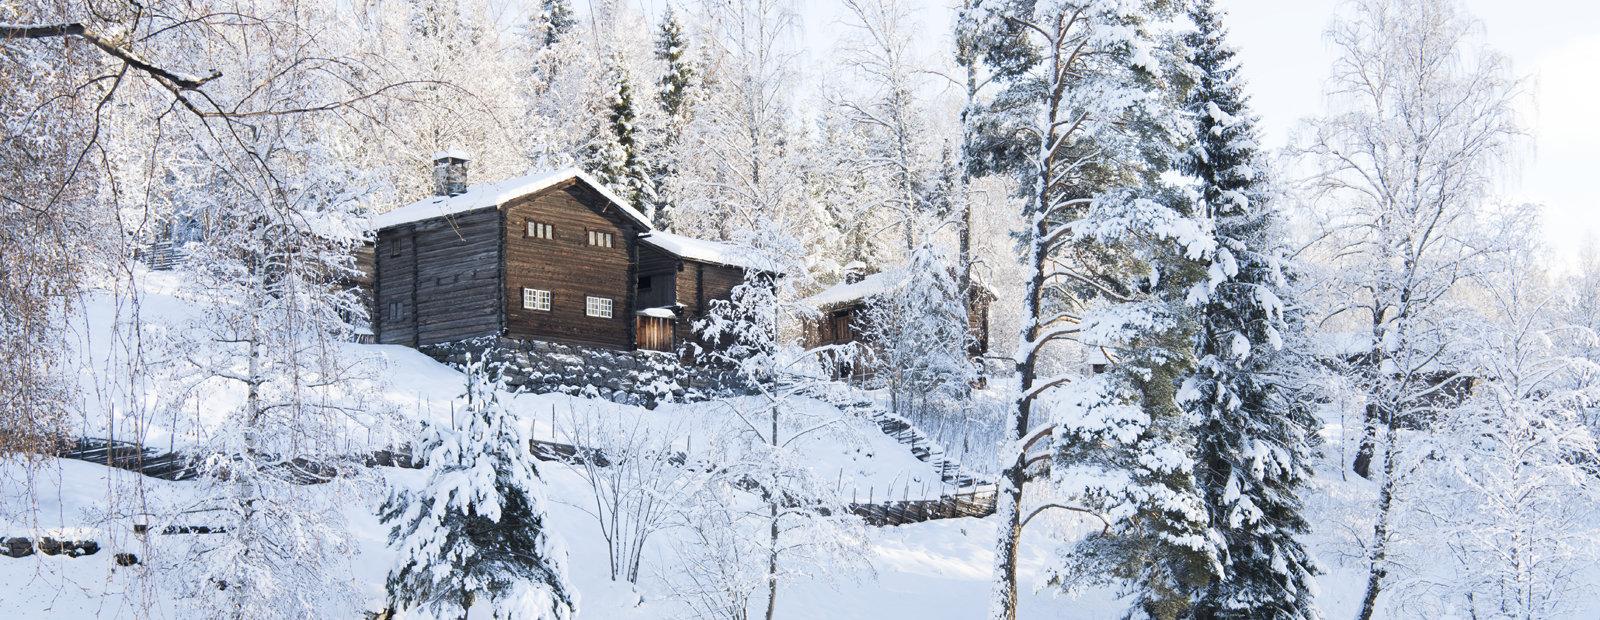 Laftet tømmerhus i vinterlandskap på friluftsmuseet Maihaugen på Lillehammer.